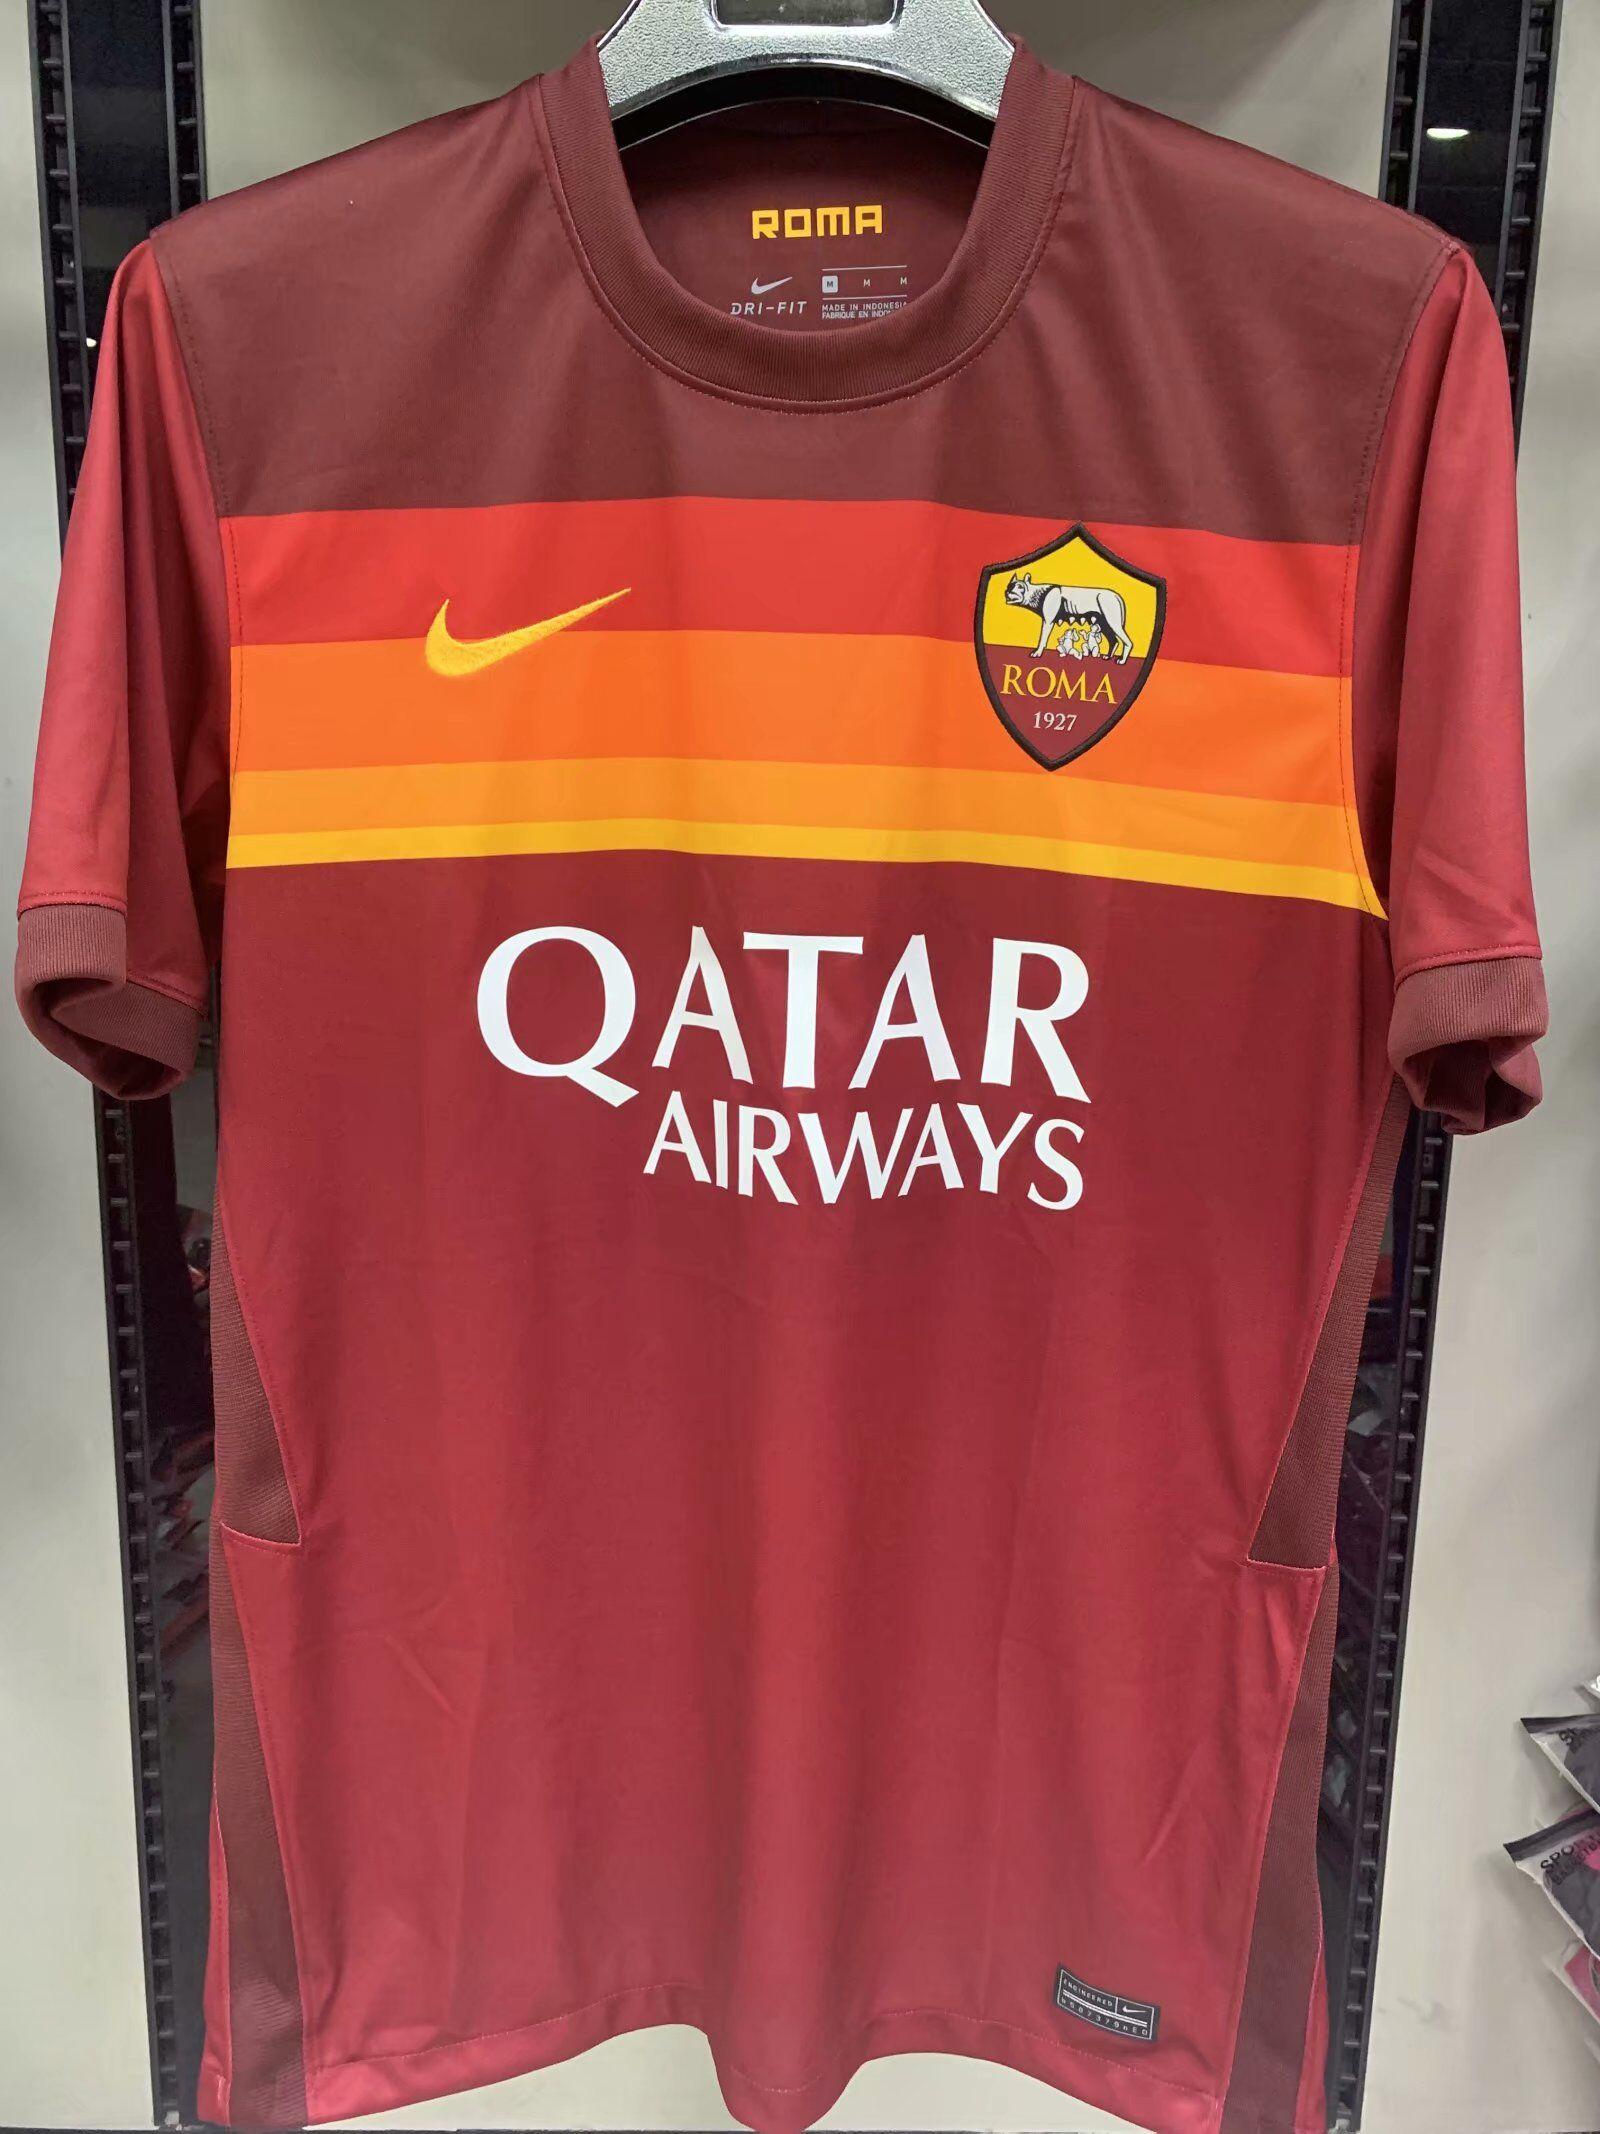 AS Roma 2021 nouveau maillot domicile football